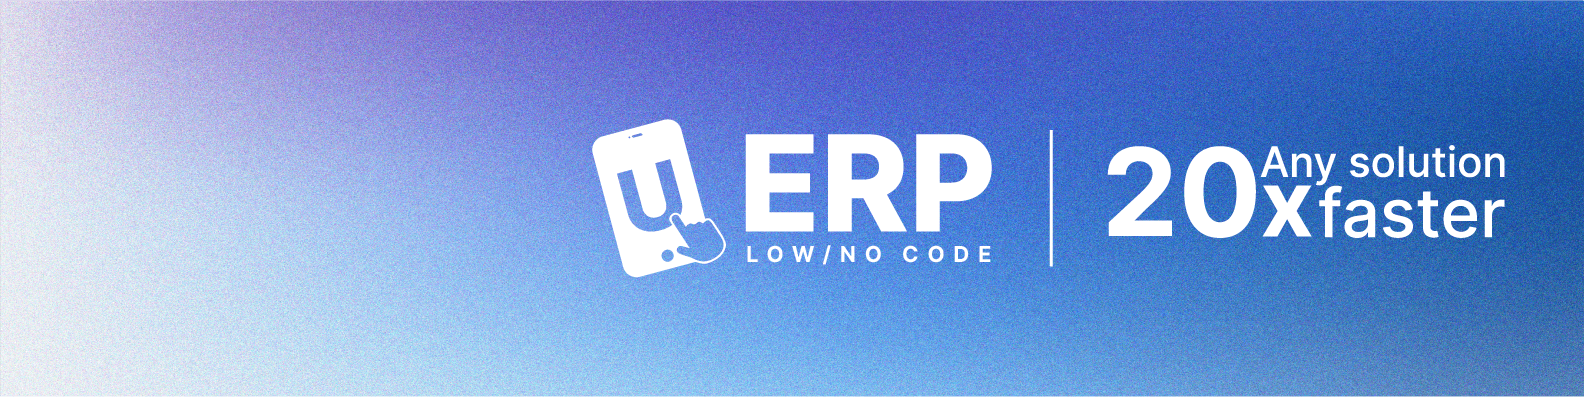 Avis U-ERP APPS : Usine d'applications mobiles zéro code - Appvizer